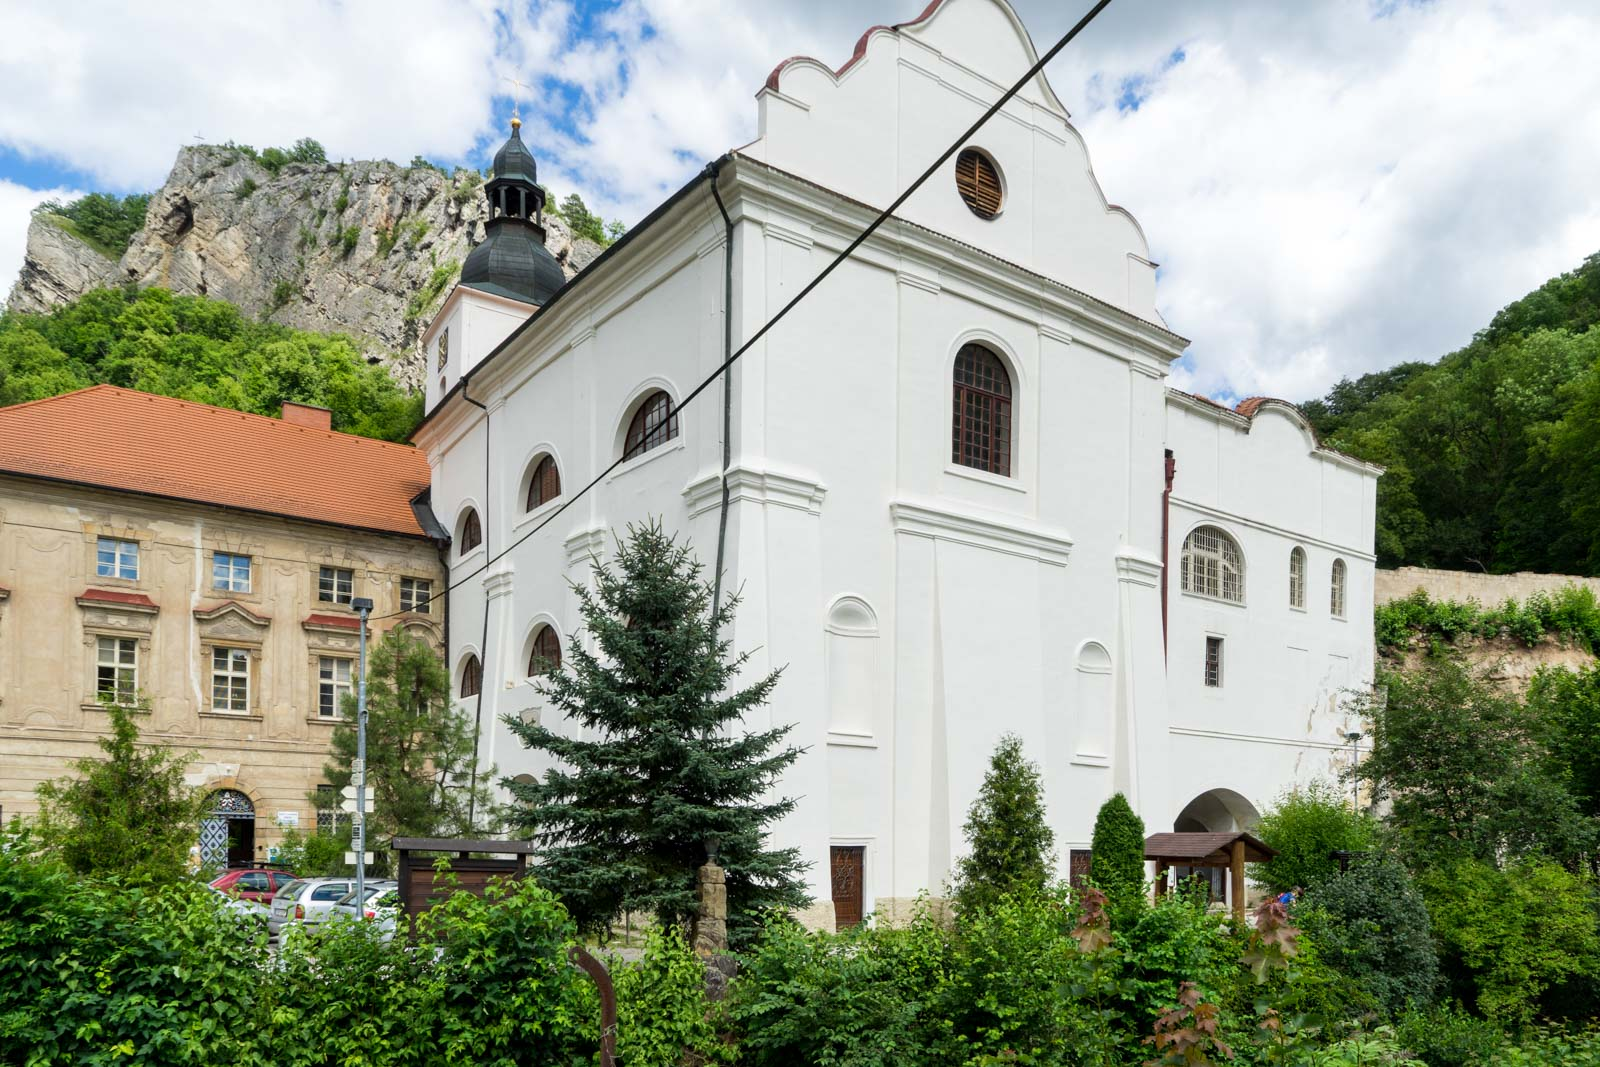 Svatý Jan pod Skalou, Czech Republic